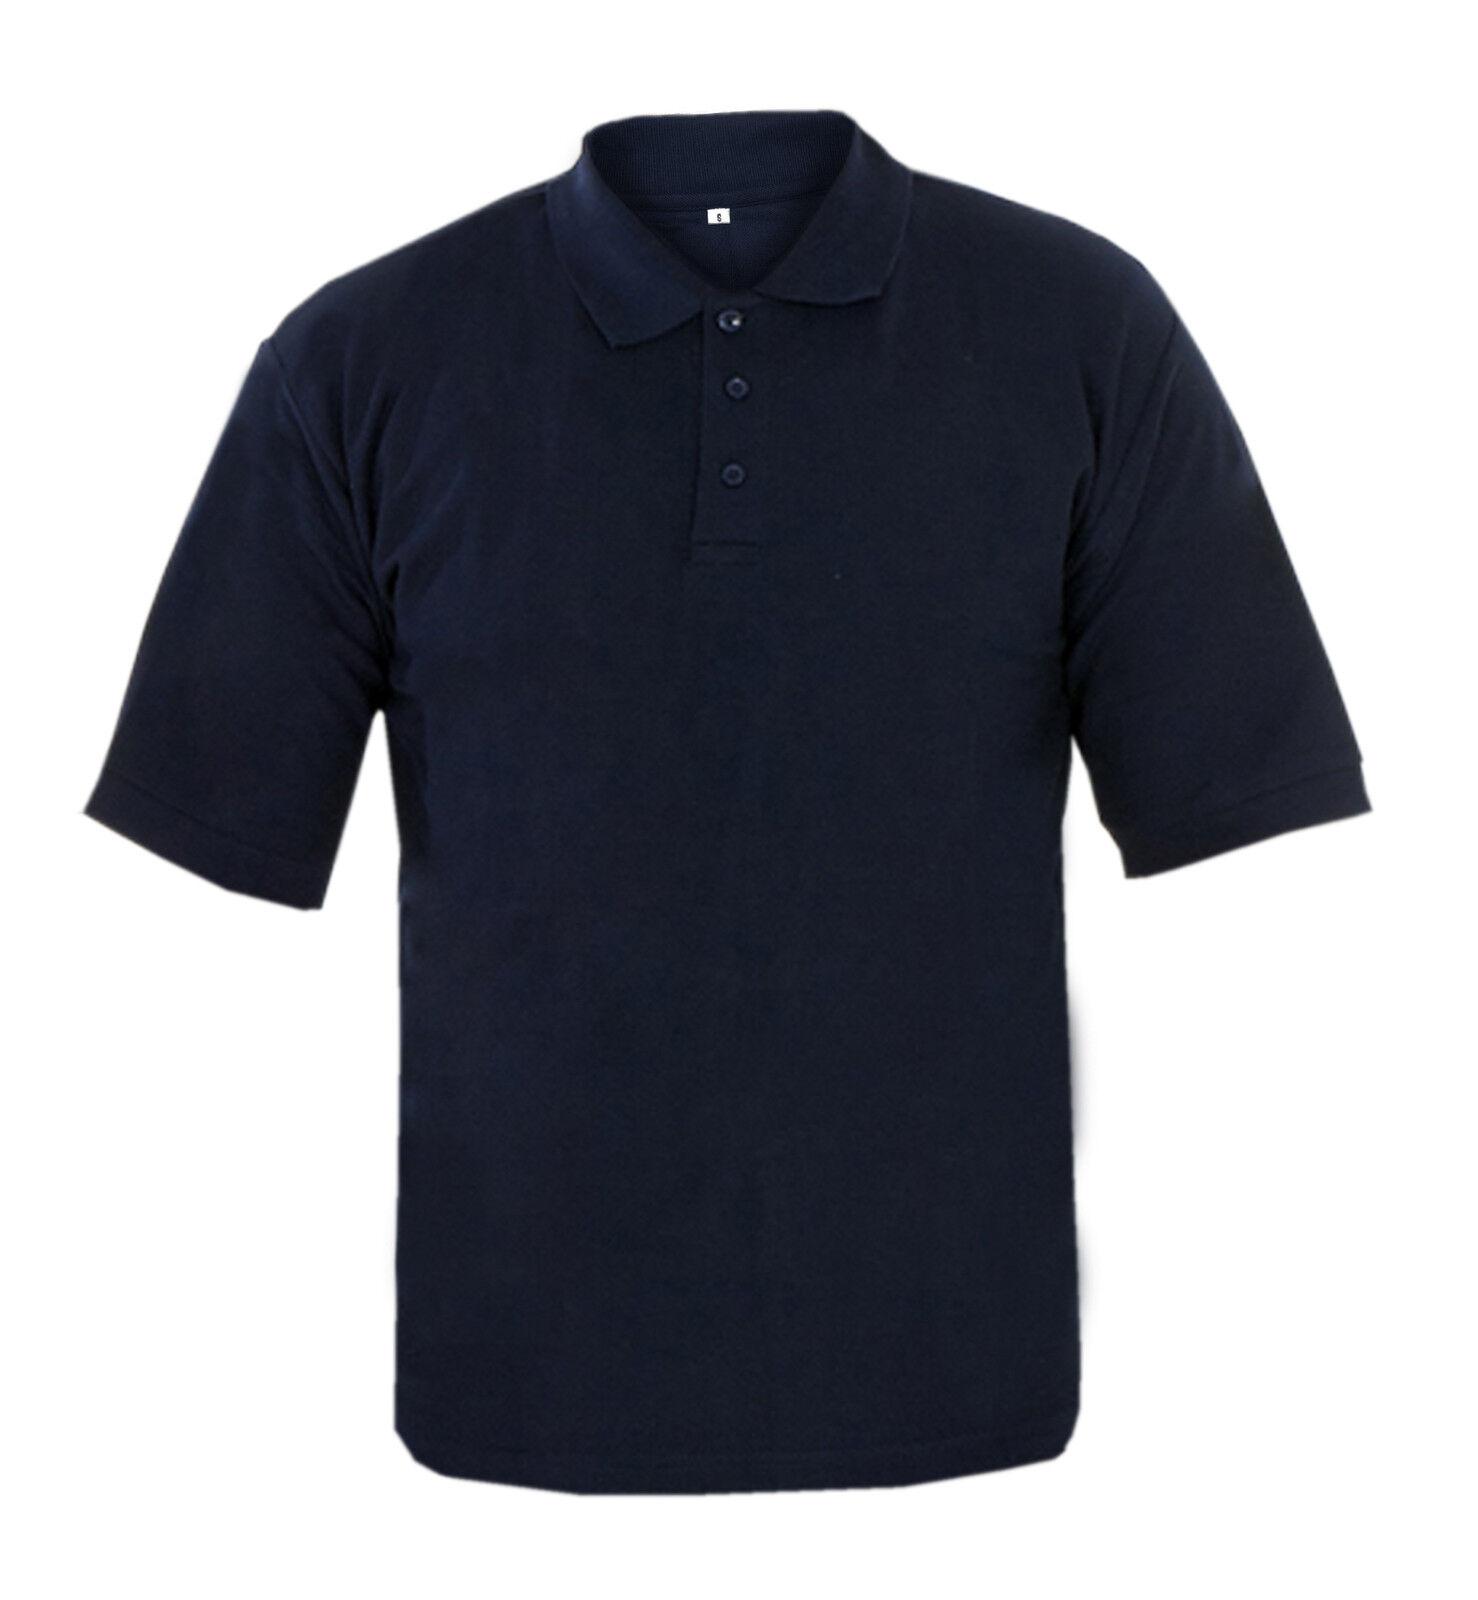 Mens T Shirts Sports Gym Yoga Plain Shirt Cotton Summer Tops Multi-color S-2XL